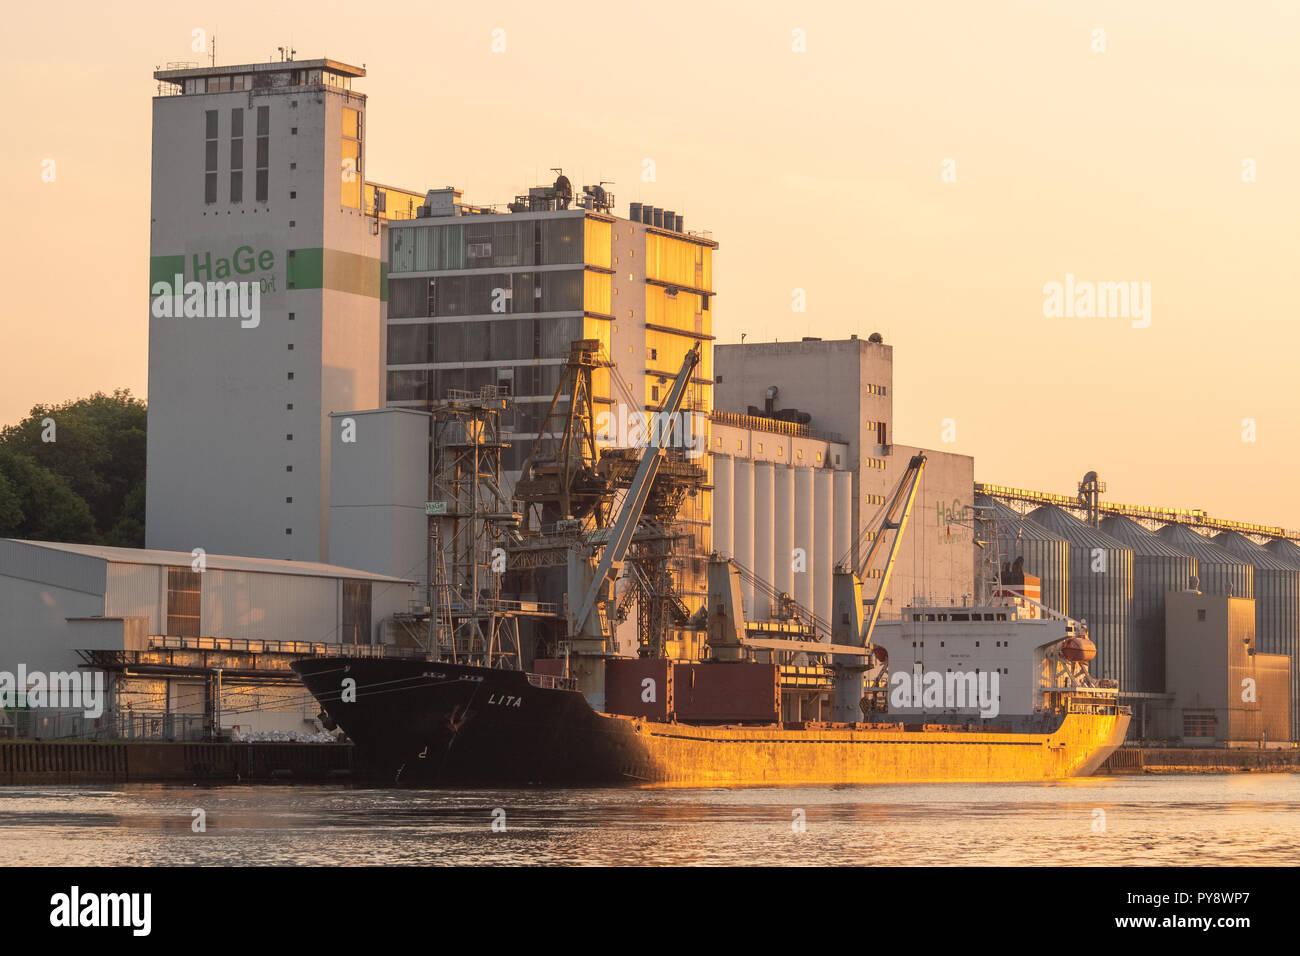 Lita loading grain at the HaGe-Terminal in Kiel - Stock Image